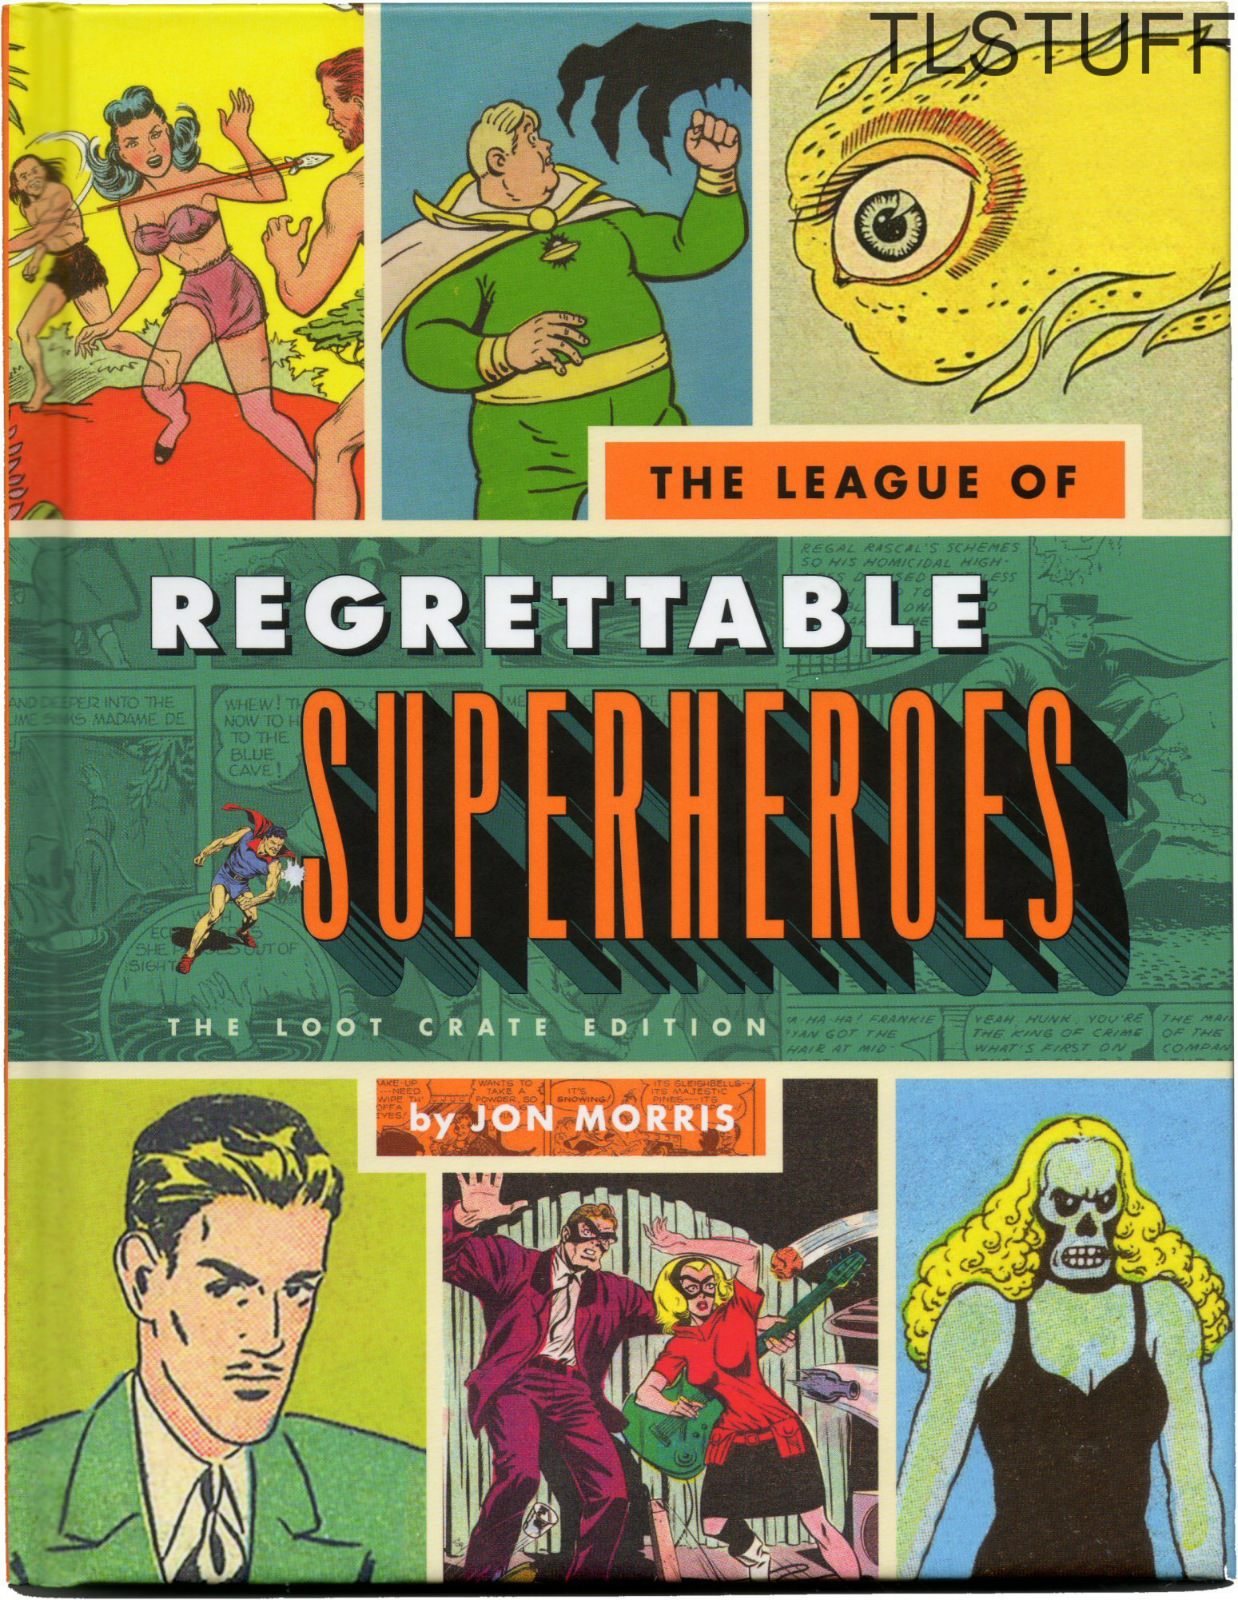 The League of Regrettable Superheroes by Jon Morri